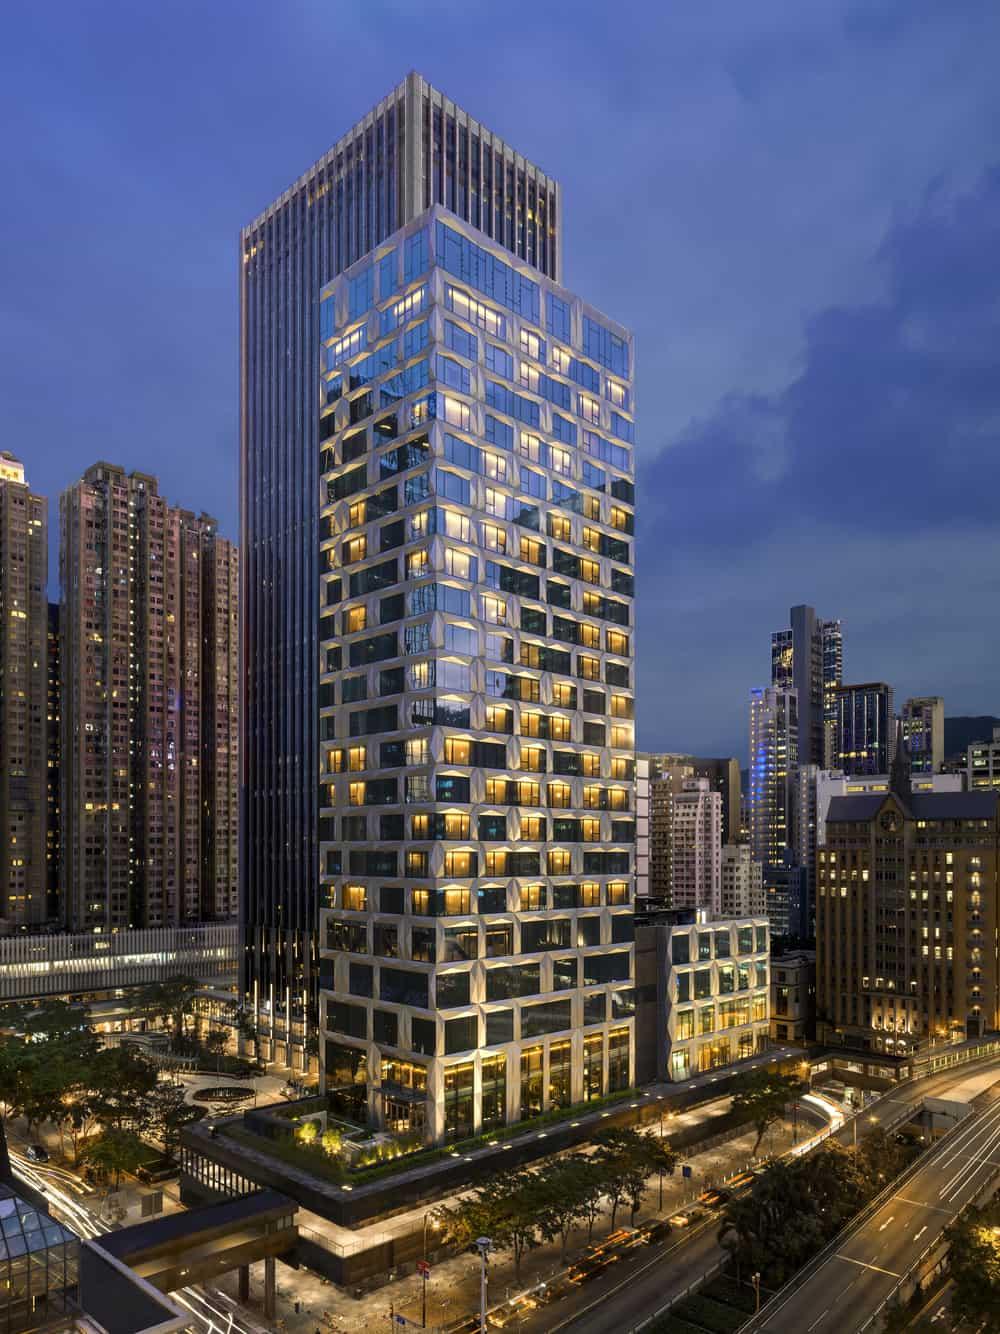 Hotel St. Regis Hong Kong Buka April 2019